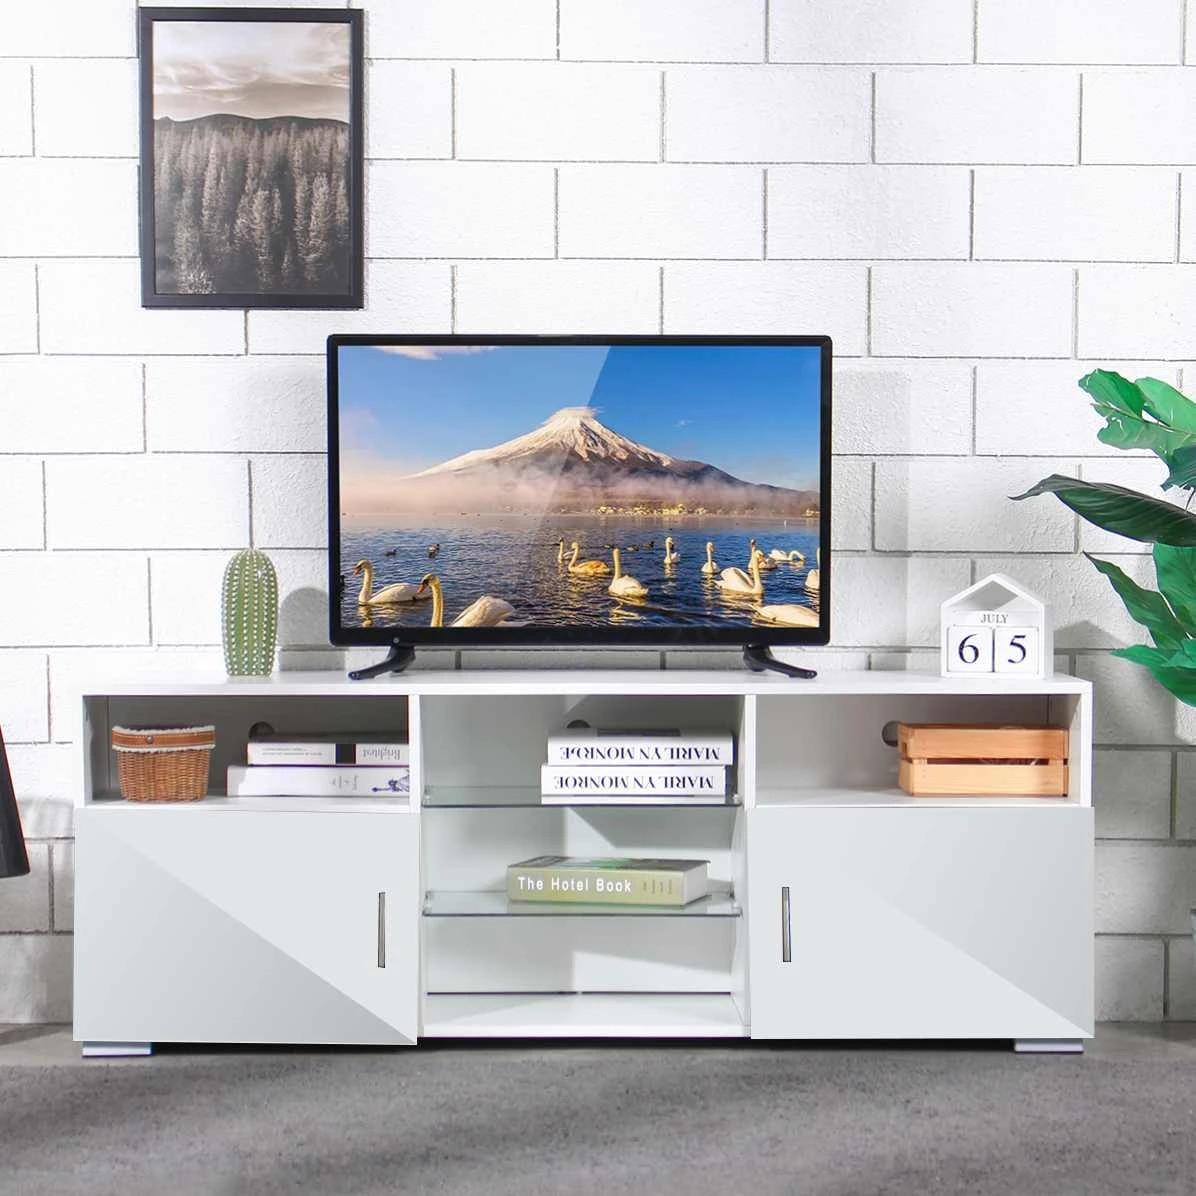 57 led light high gloss tv unit cabinet stand white black wood table living room meuble tv bedroom furniture desk us shipping